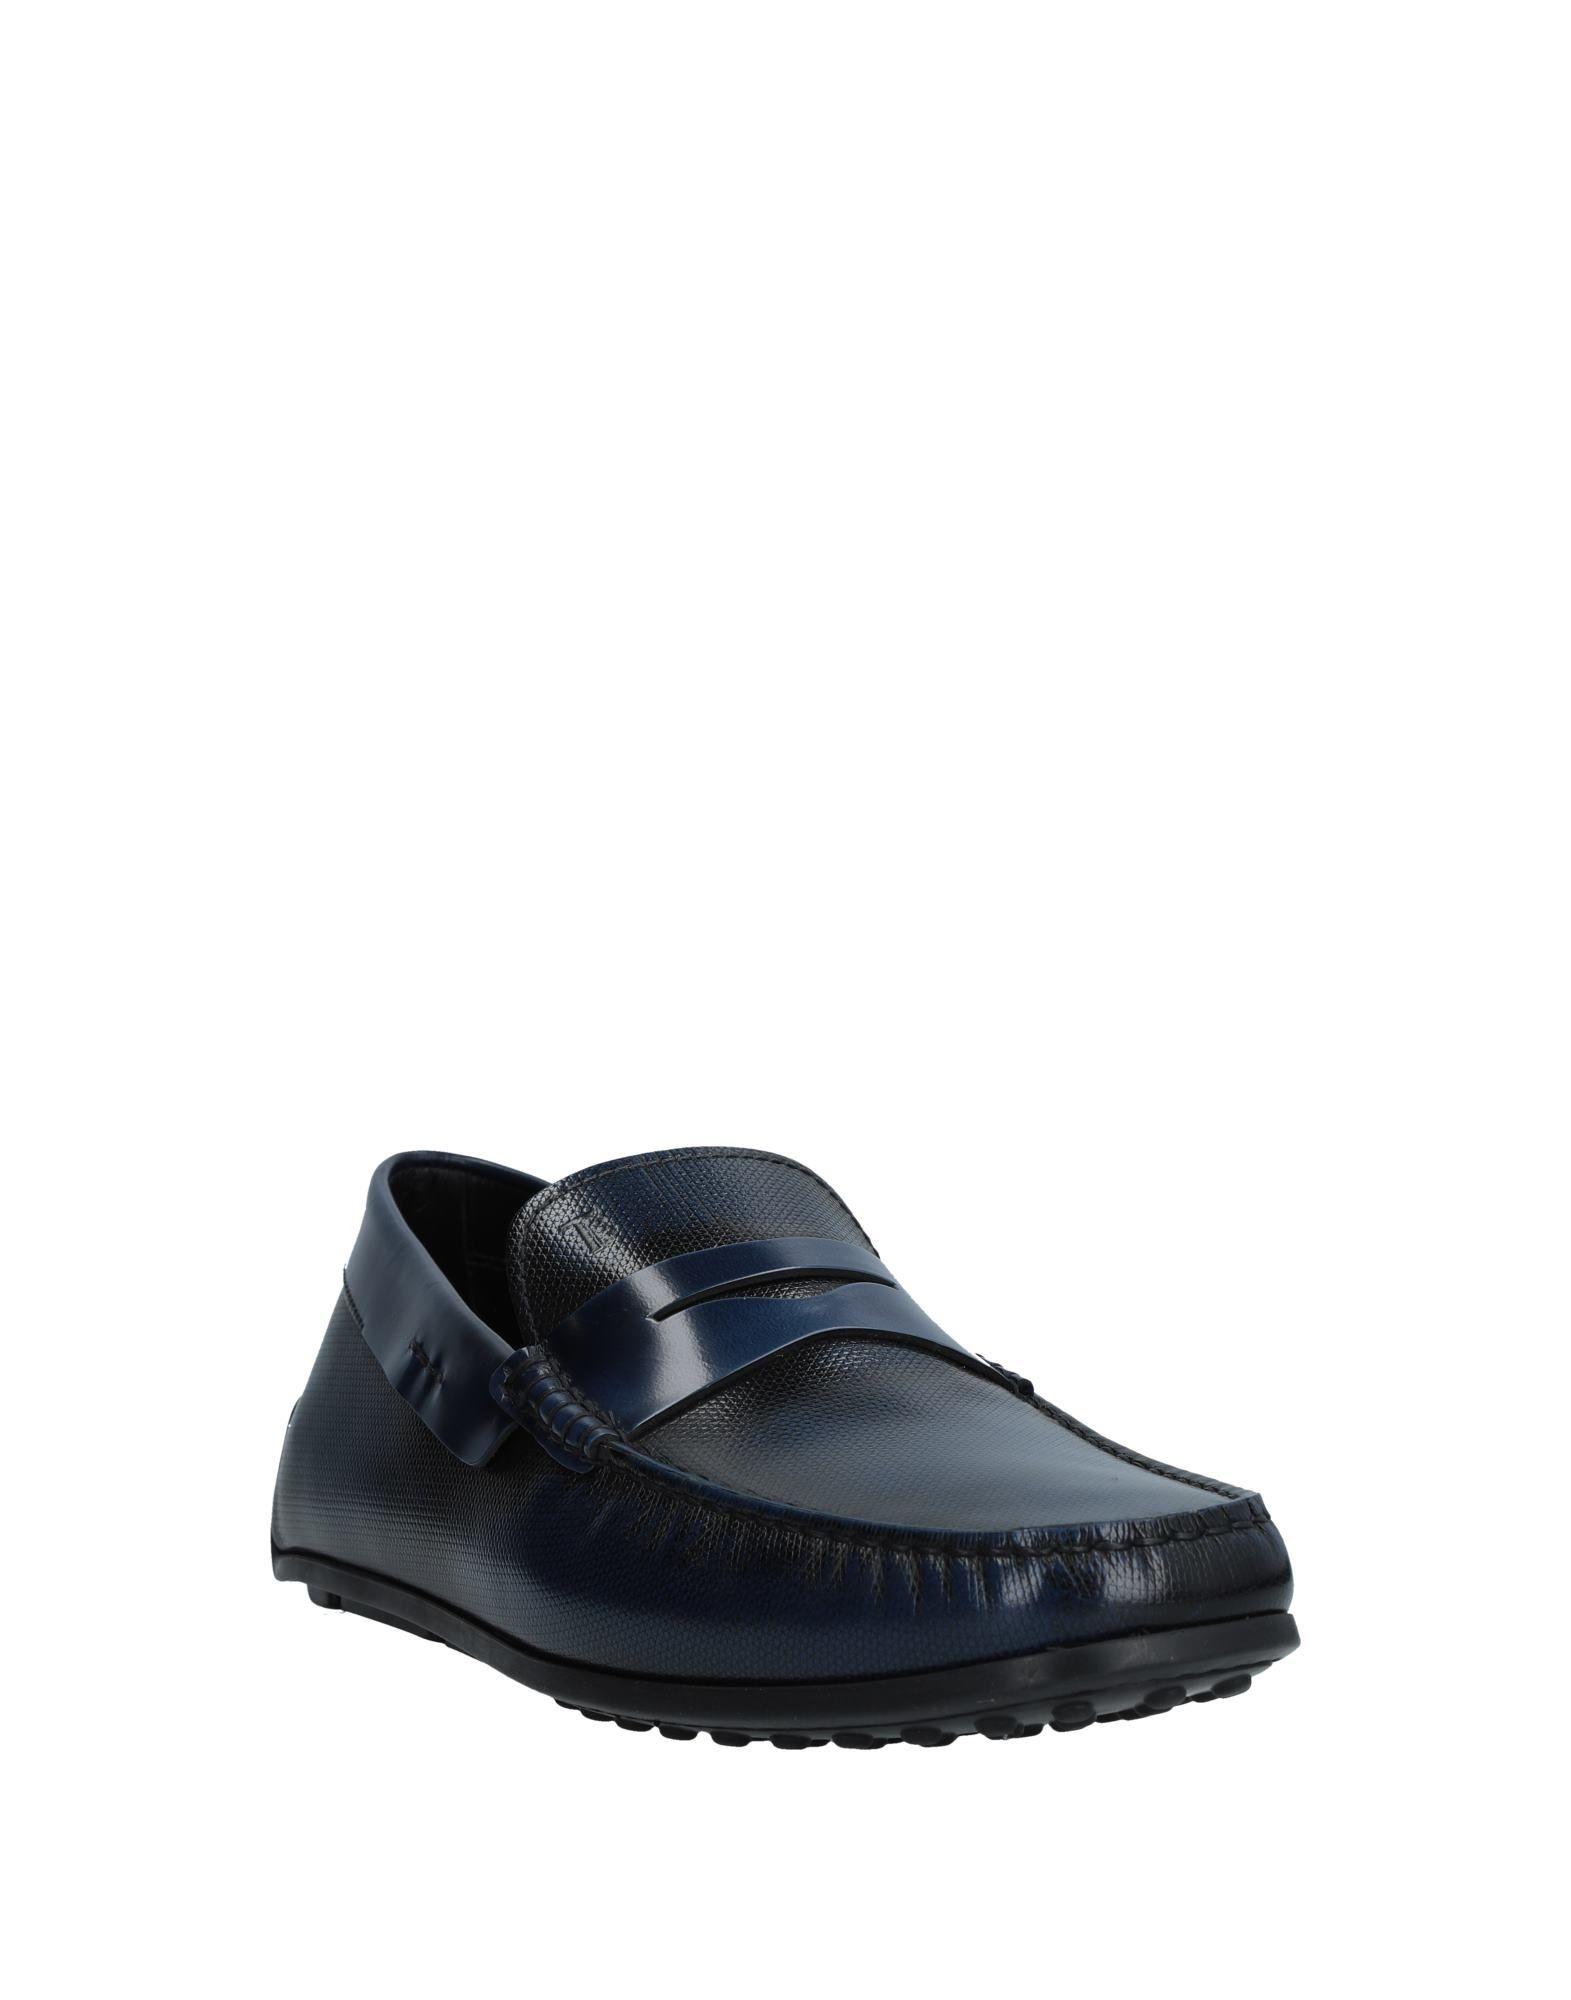 Tod's Mokassins Herren beliebte  11542078FW Gute Qualität beliebte Herren Schuhe b77de5